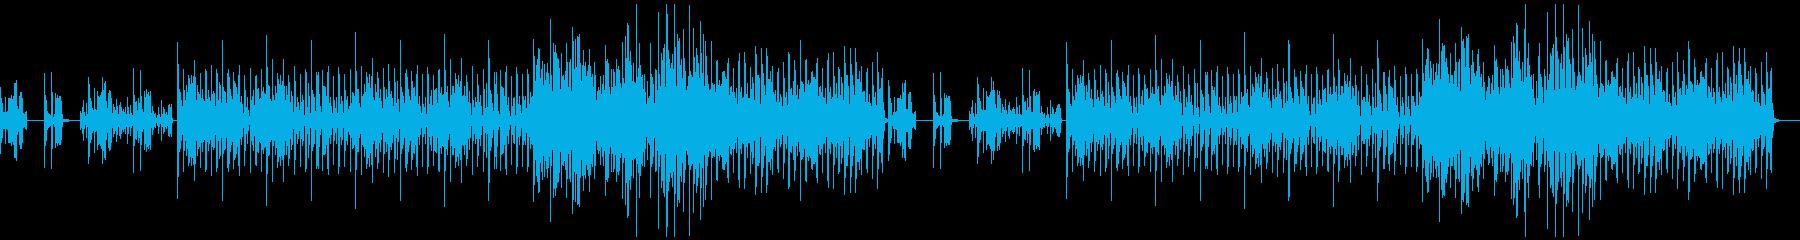 【Jazz】おしゃれなジャズハウス・1の再生済みの波形